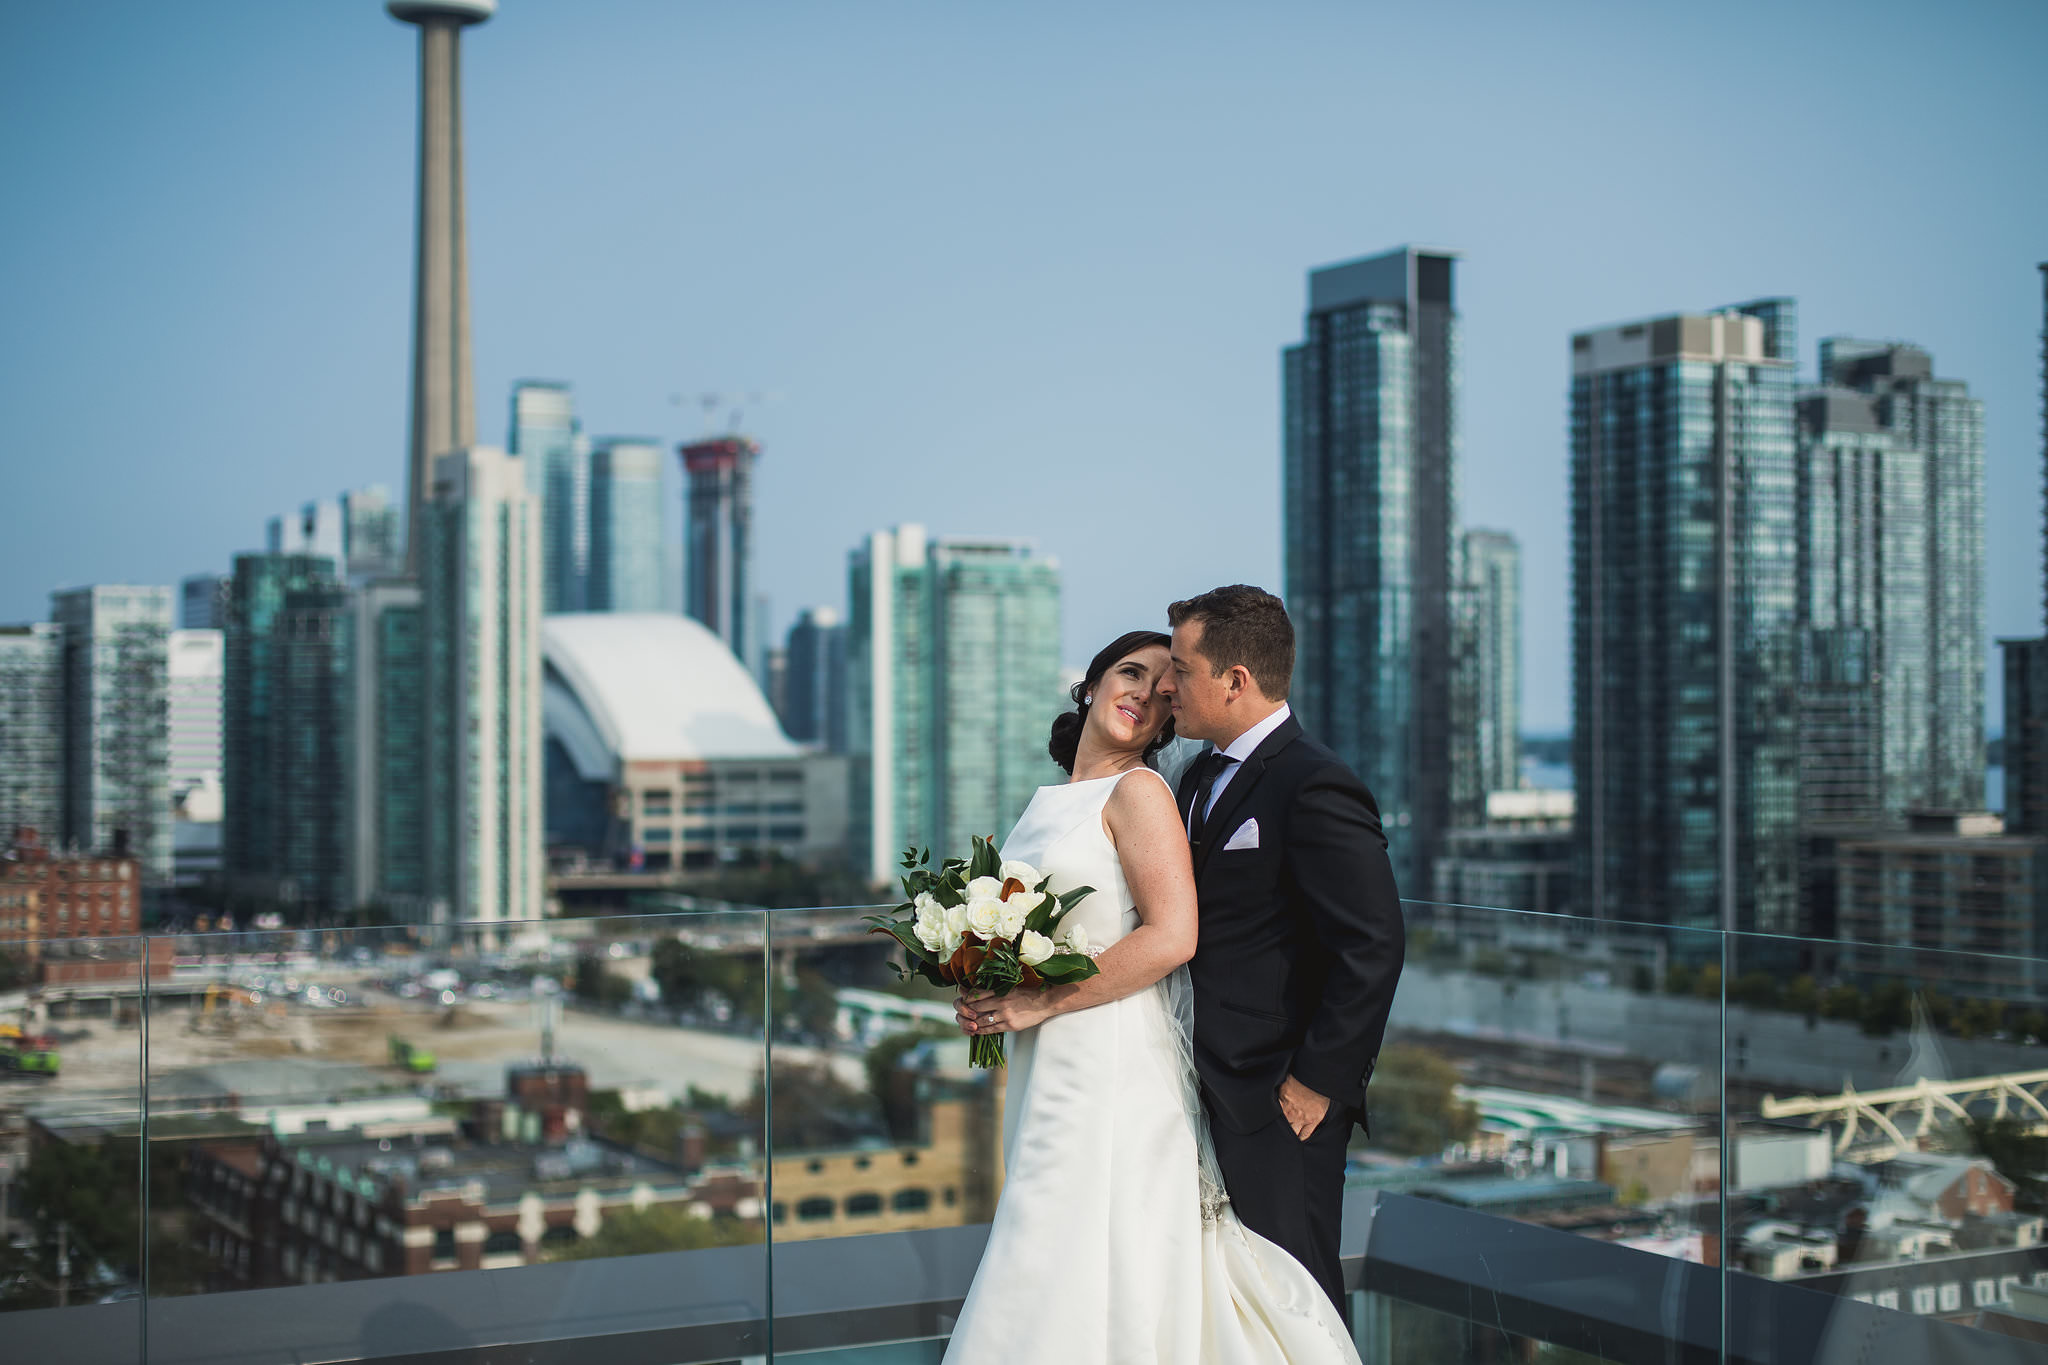 Cristin Rob Thompson Hotel Wedding Photos 378 - Thompson Hotel Wedding Photos